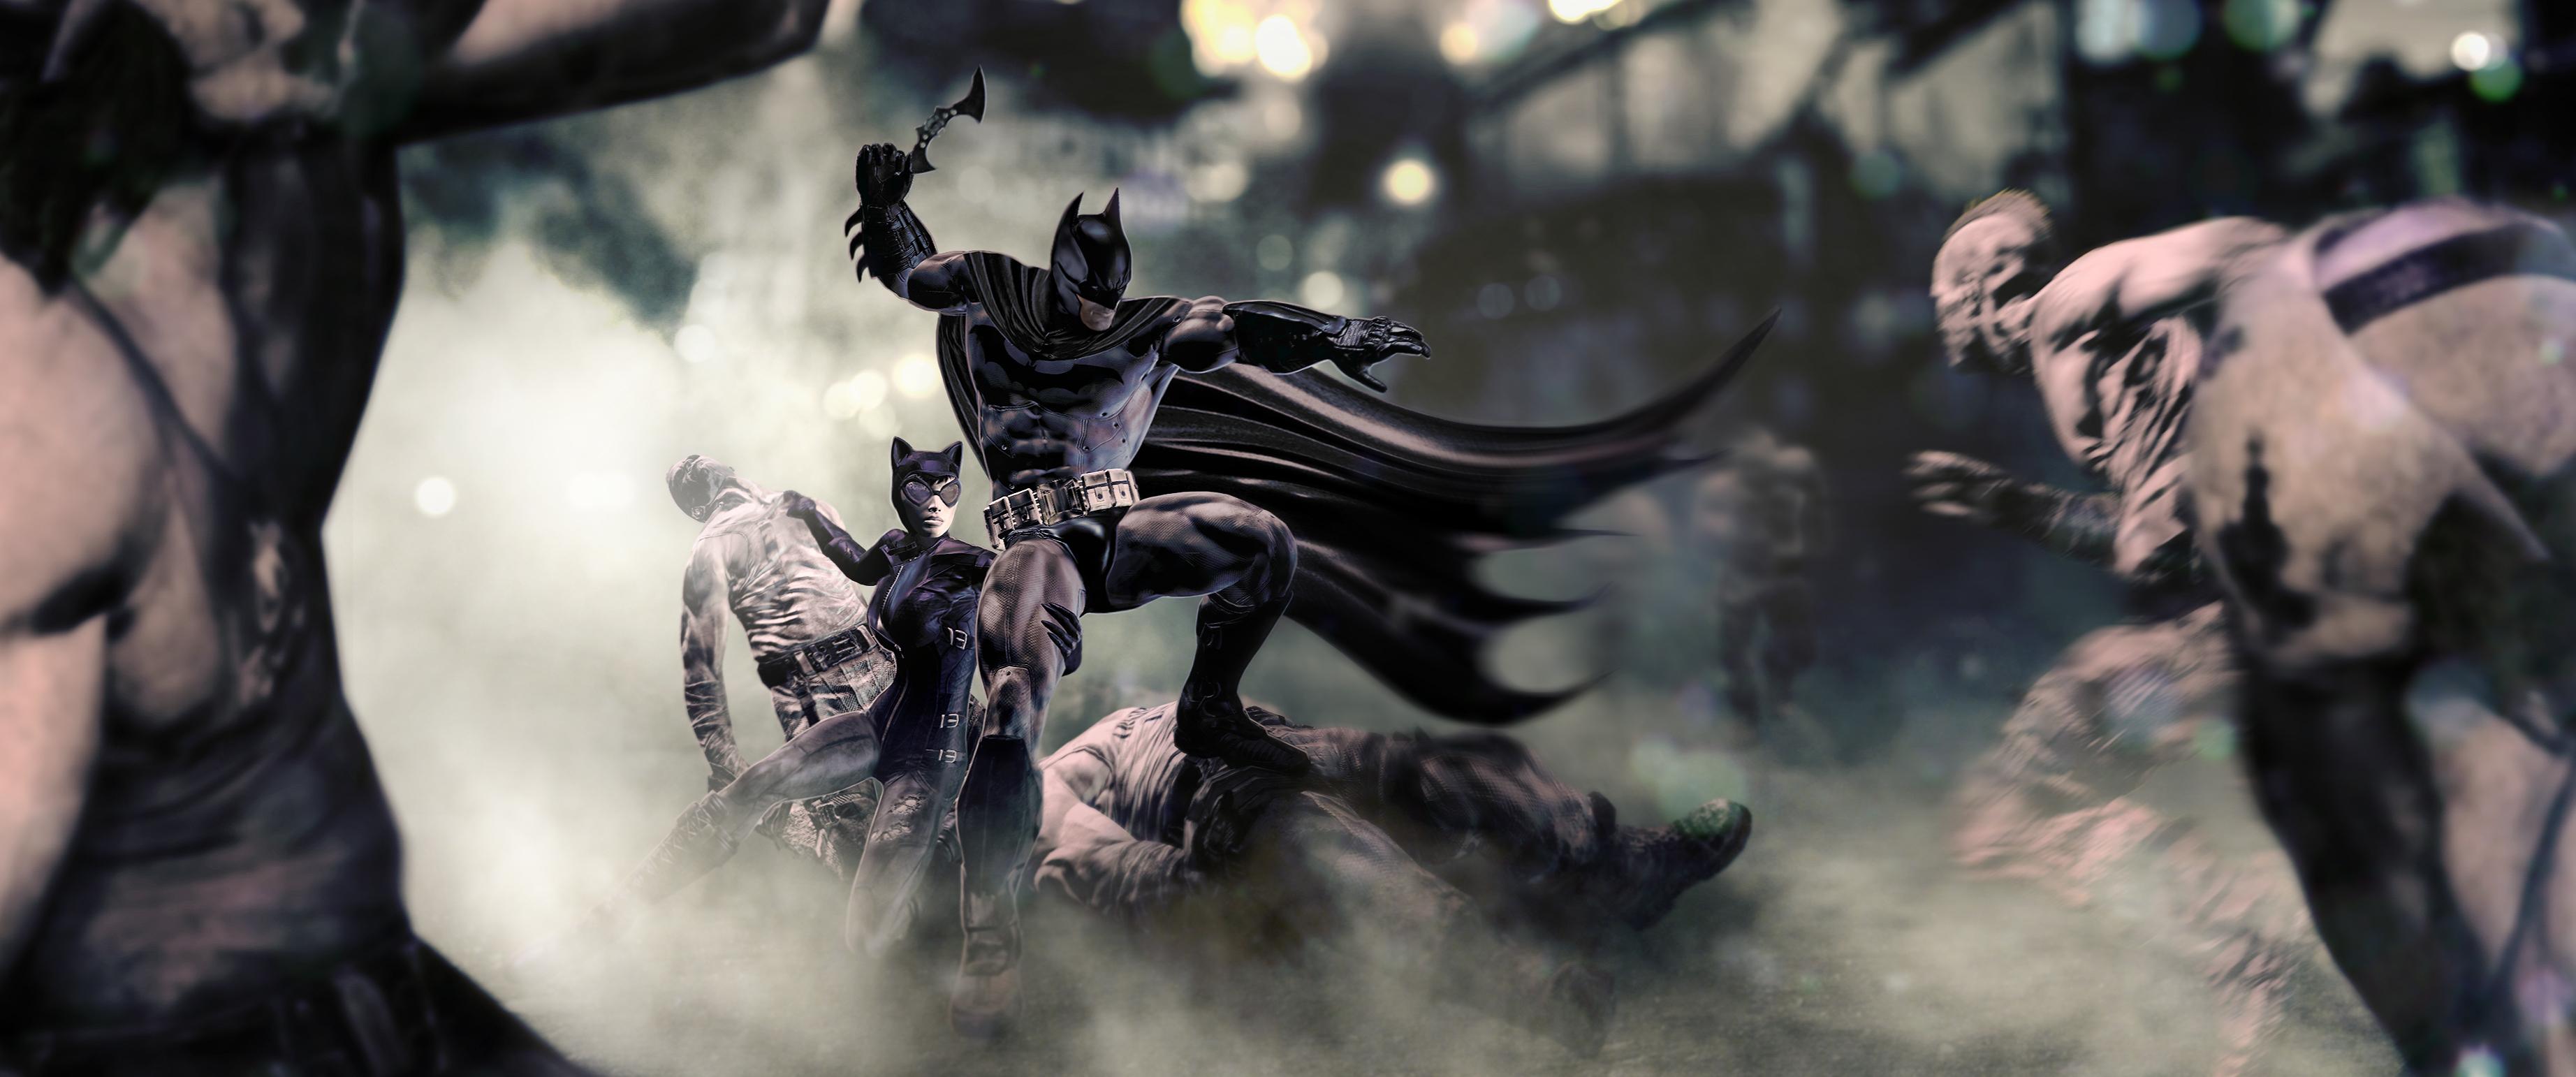 Batman Arkham City Catwoman, HD Games, 4k Wallpapers ...